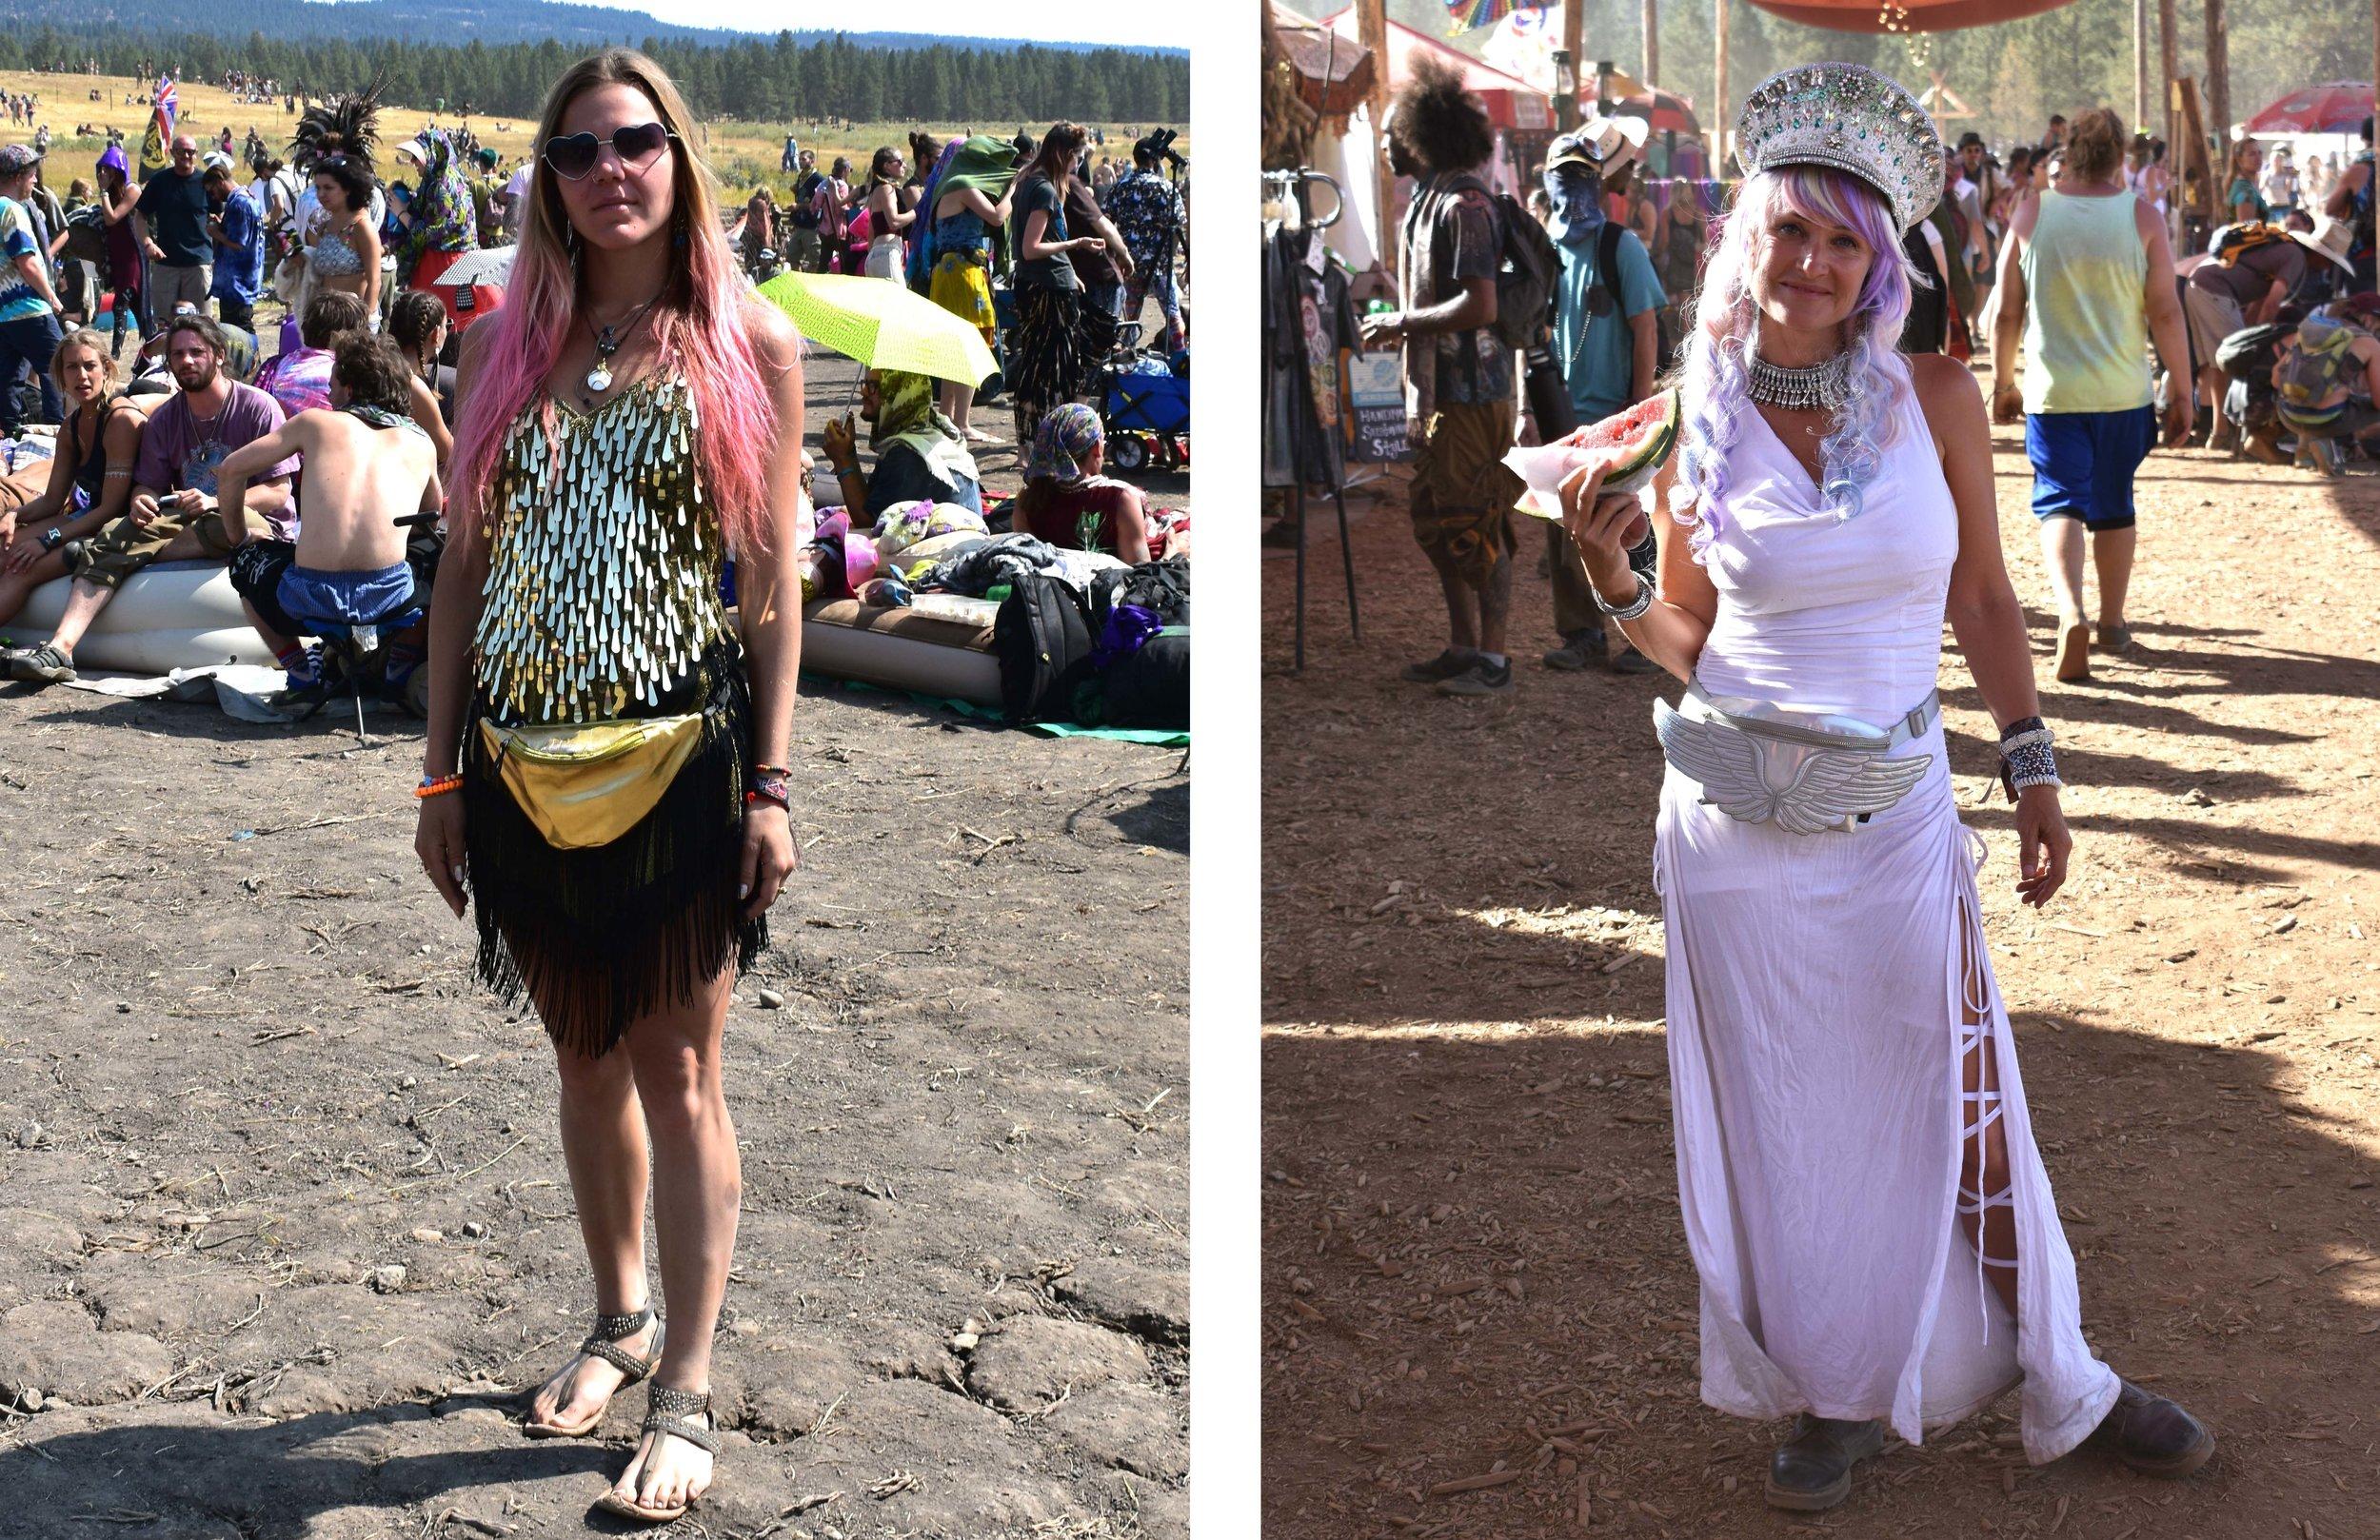 Oregon Eclipse 2017 -Symbiosis - Big Summit Prairie - Envision Festival - Sonic Bloom - Rainbow Serpent - Jaded London - Chrome Monarchy - Style Guide - Florum Magazine - Hadra - Global Gathering - Lighting in a Bottle - Festie Captain Hat - White Wednesday - Burning Man - Sparkle Pony